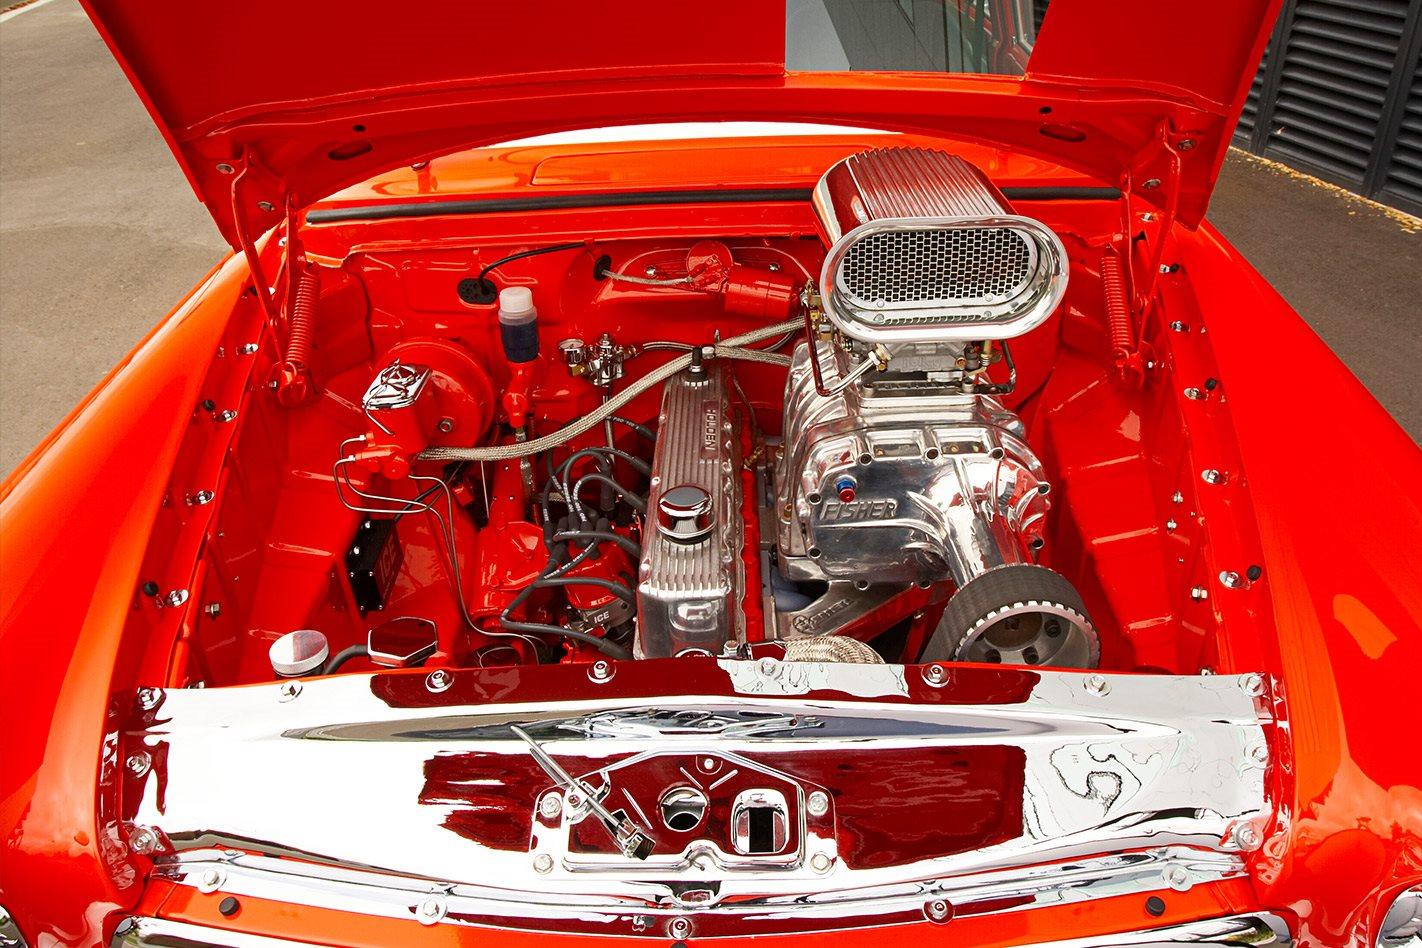 Holden FC wagon engine bay